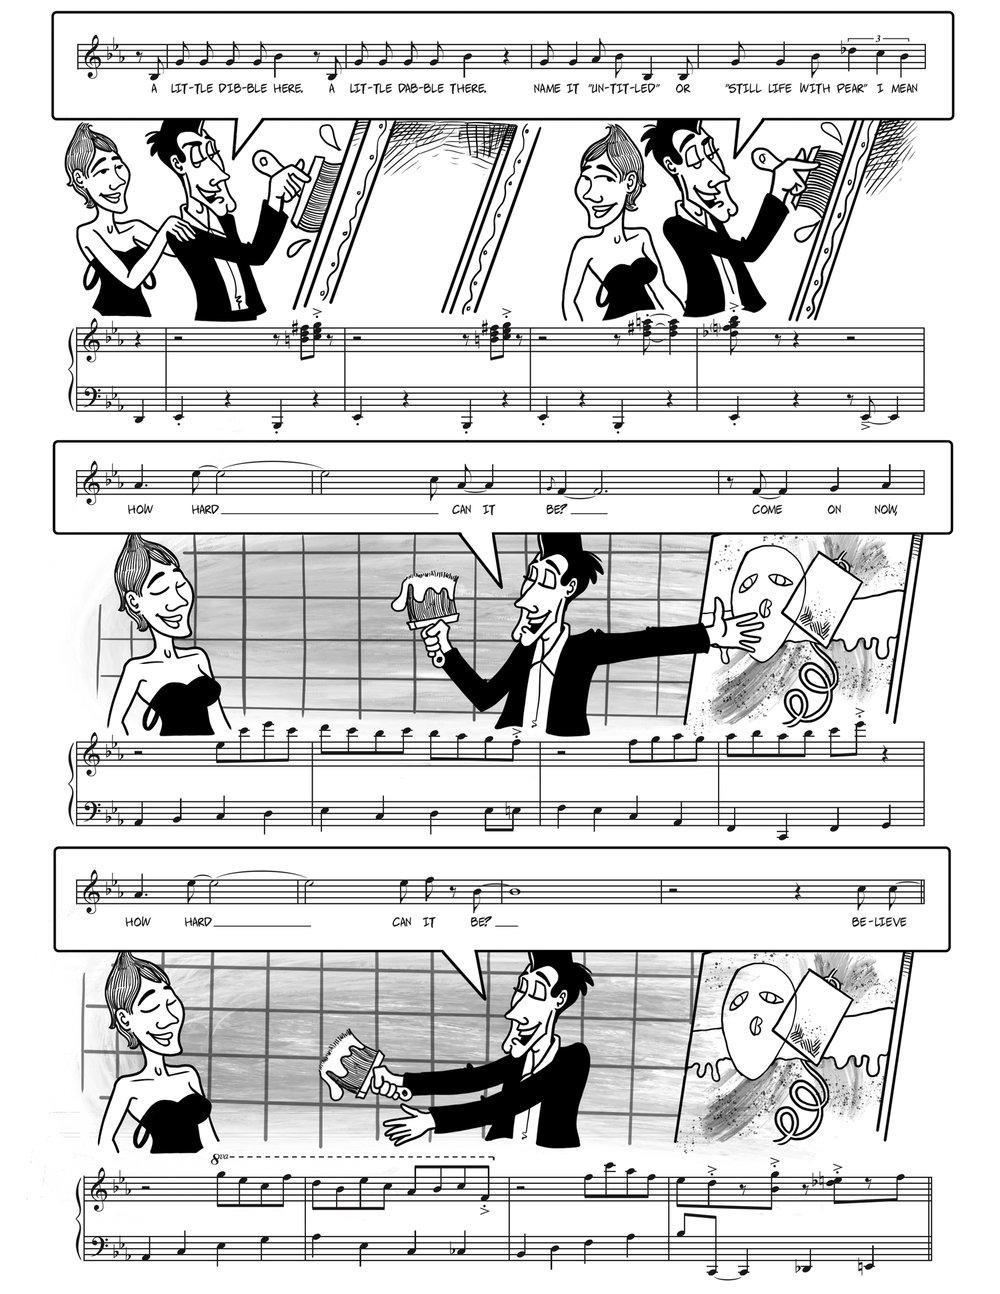 PAGE-302.jpg